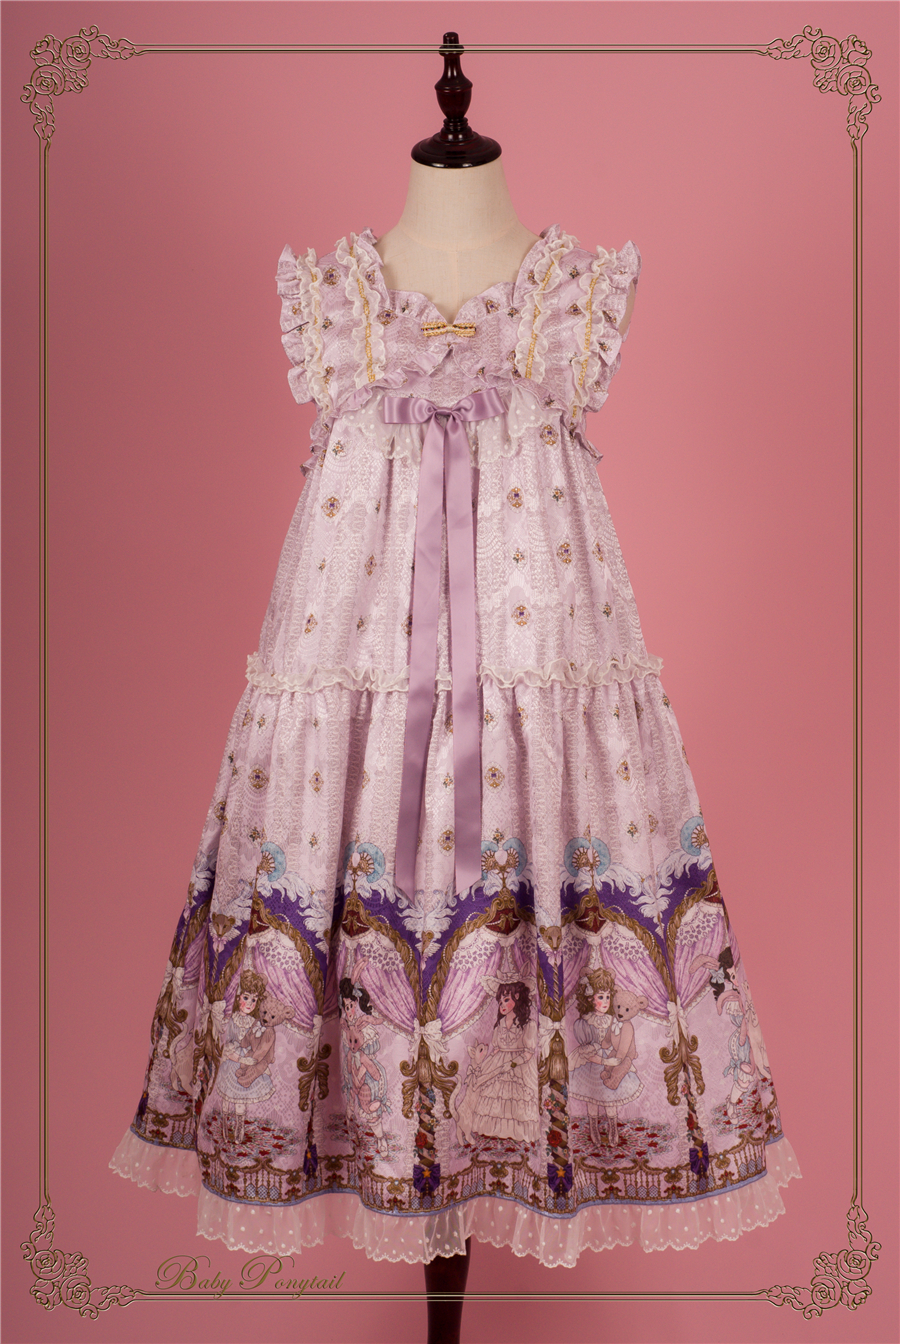 BabyPonytail_Stock Photo_My Favorite Companion_NG Lavender_0.jpg